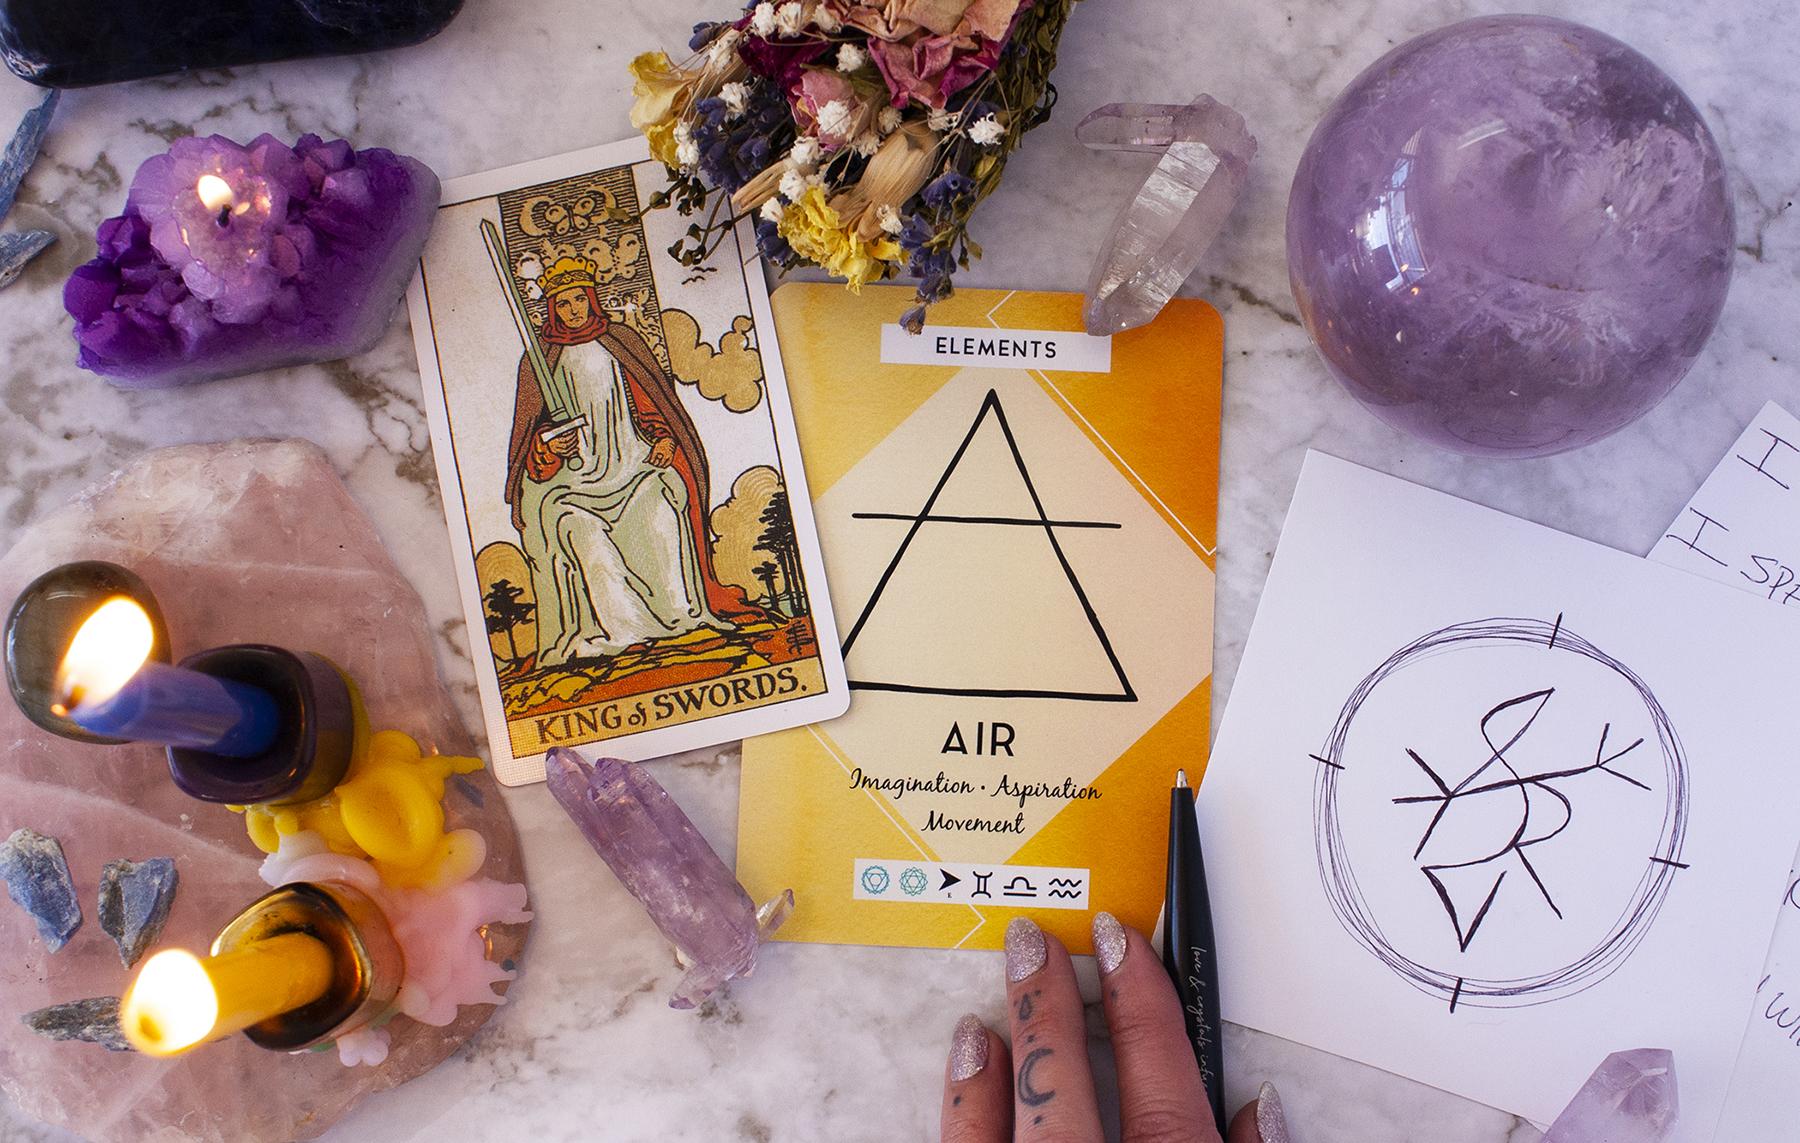 card spread for aquarius season and sigil ritual